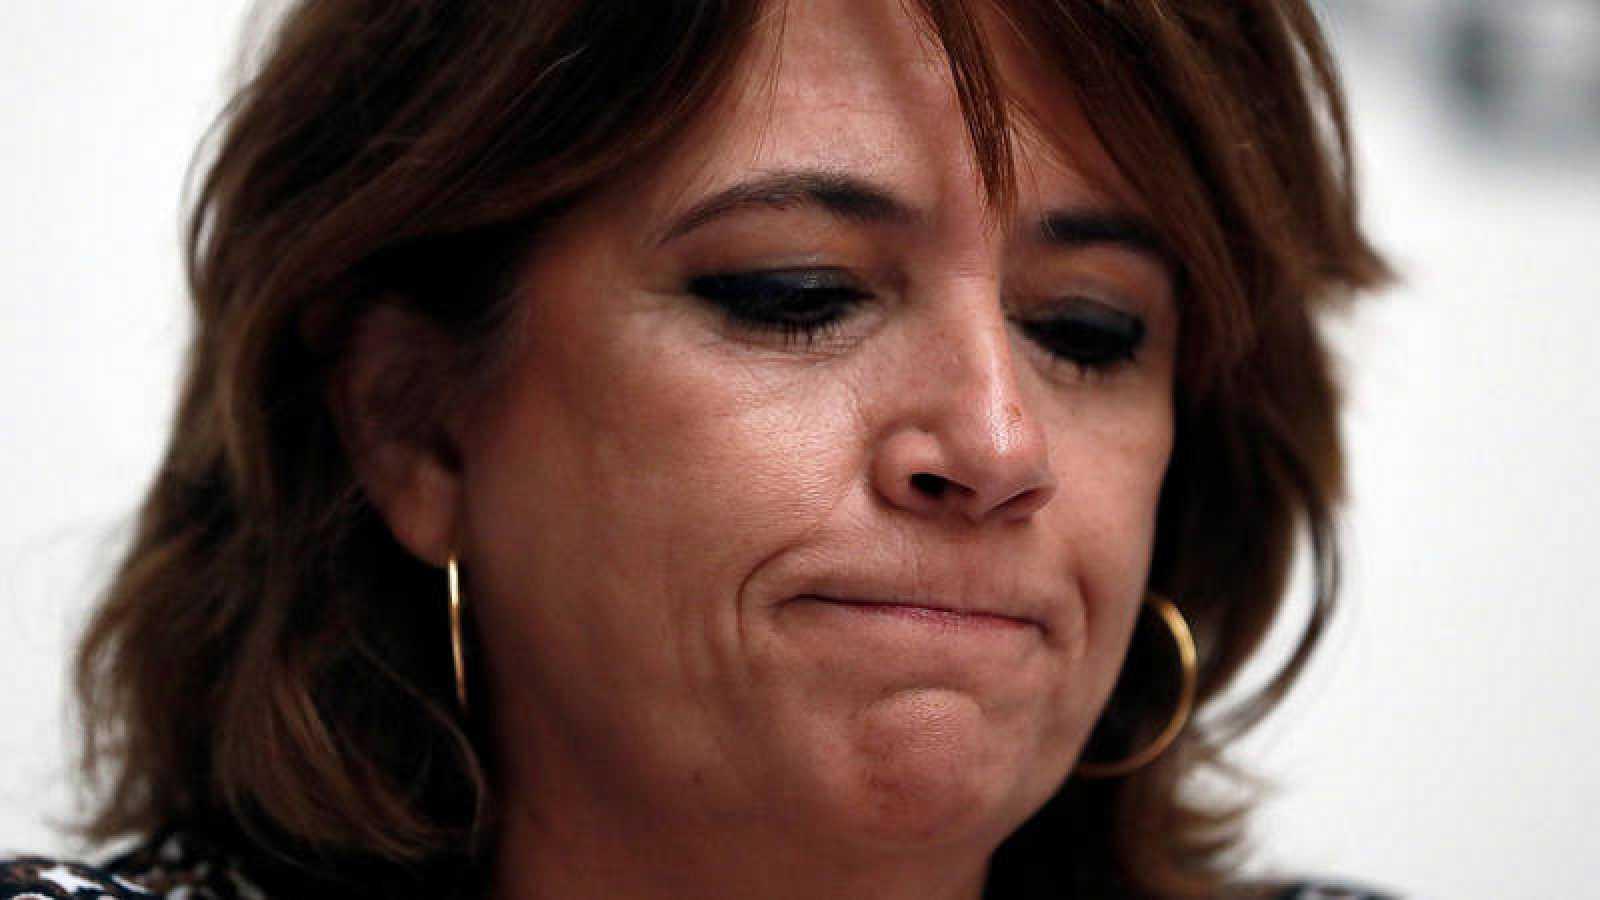 La ministra de Justicia, Dolores Delgado. Foto: Efe/Mariscal